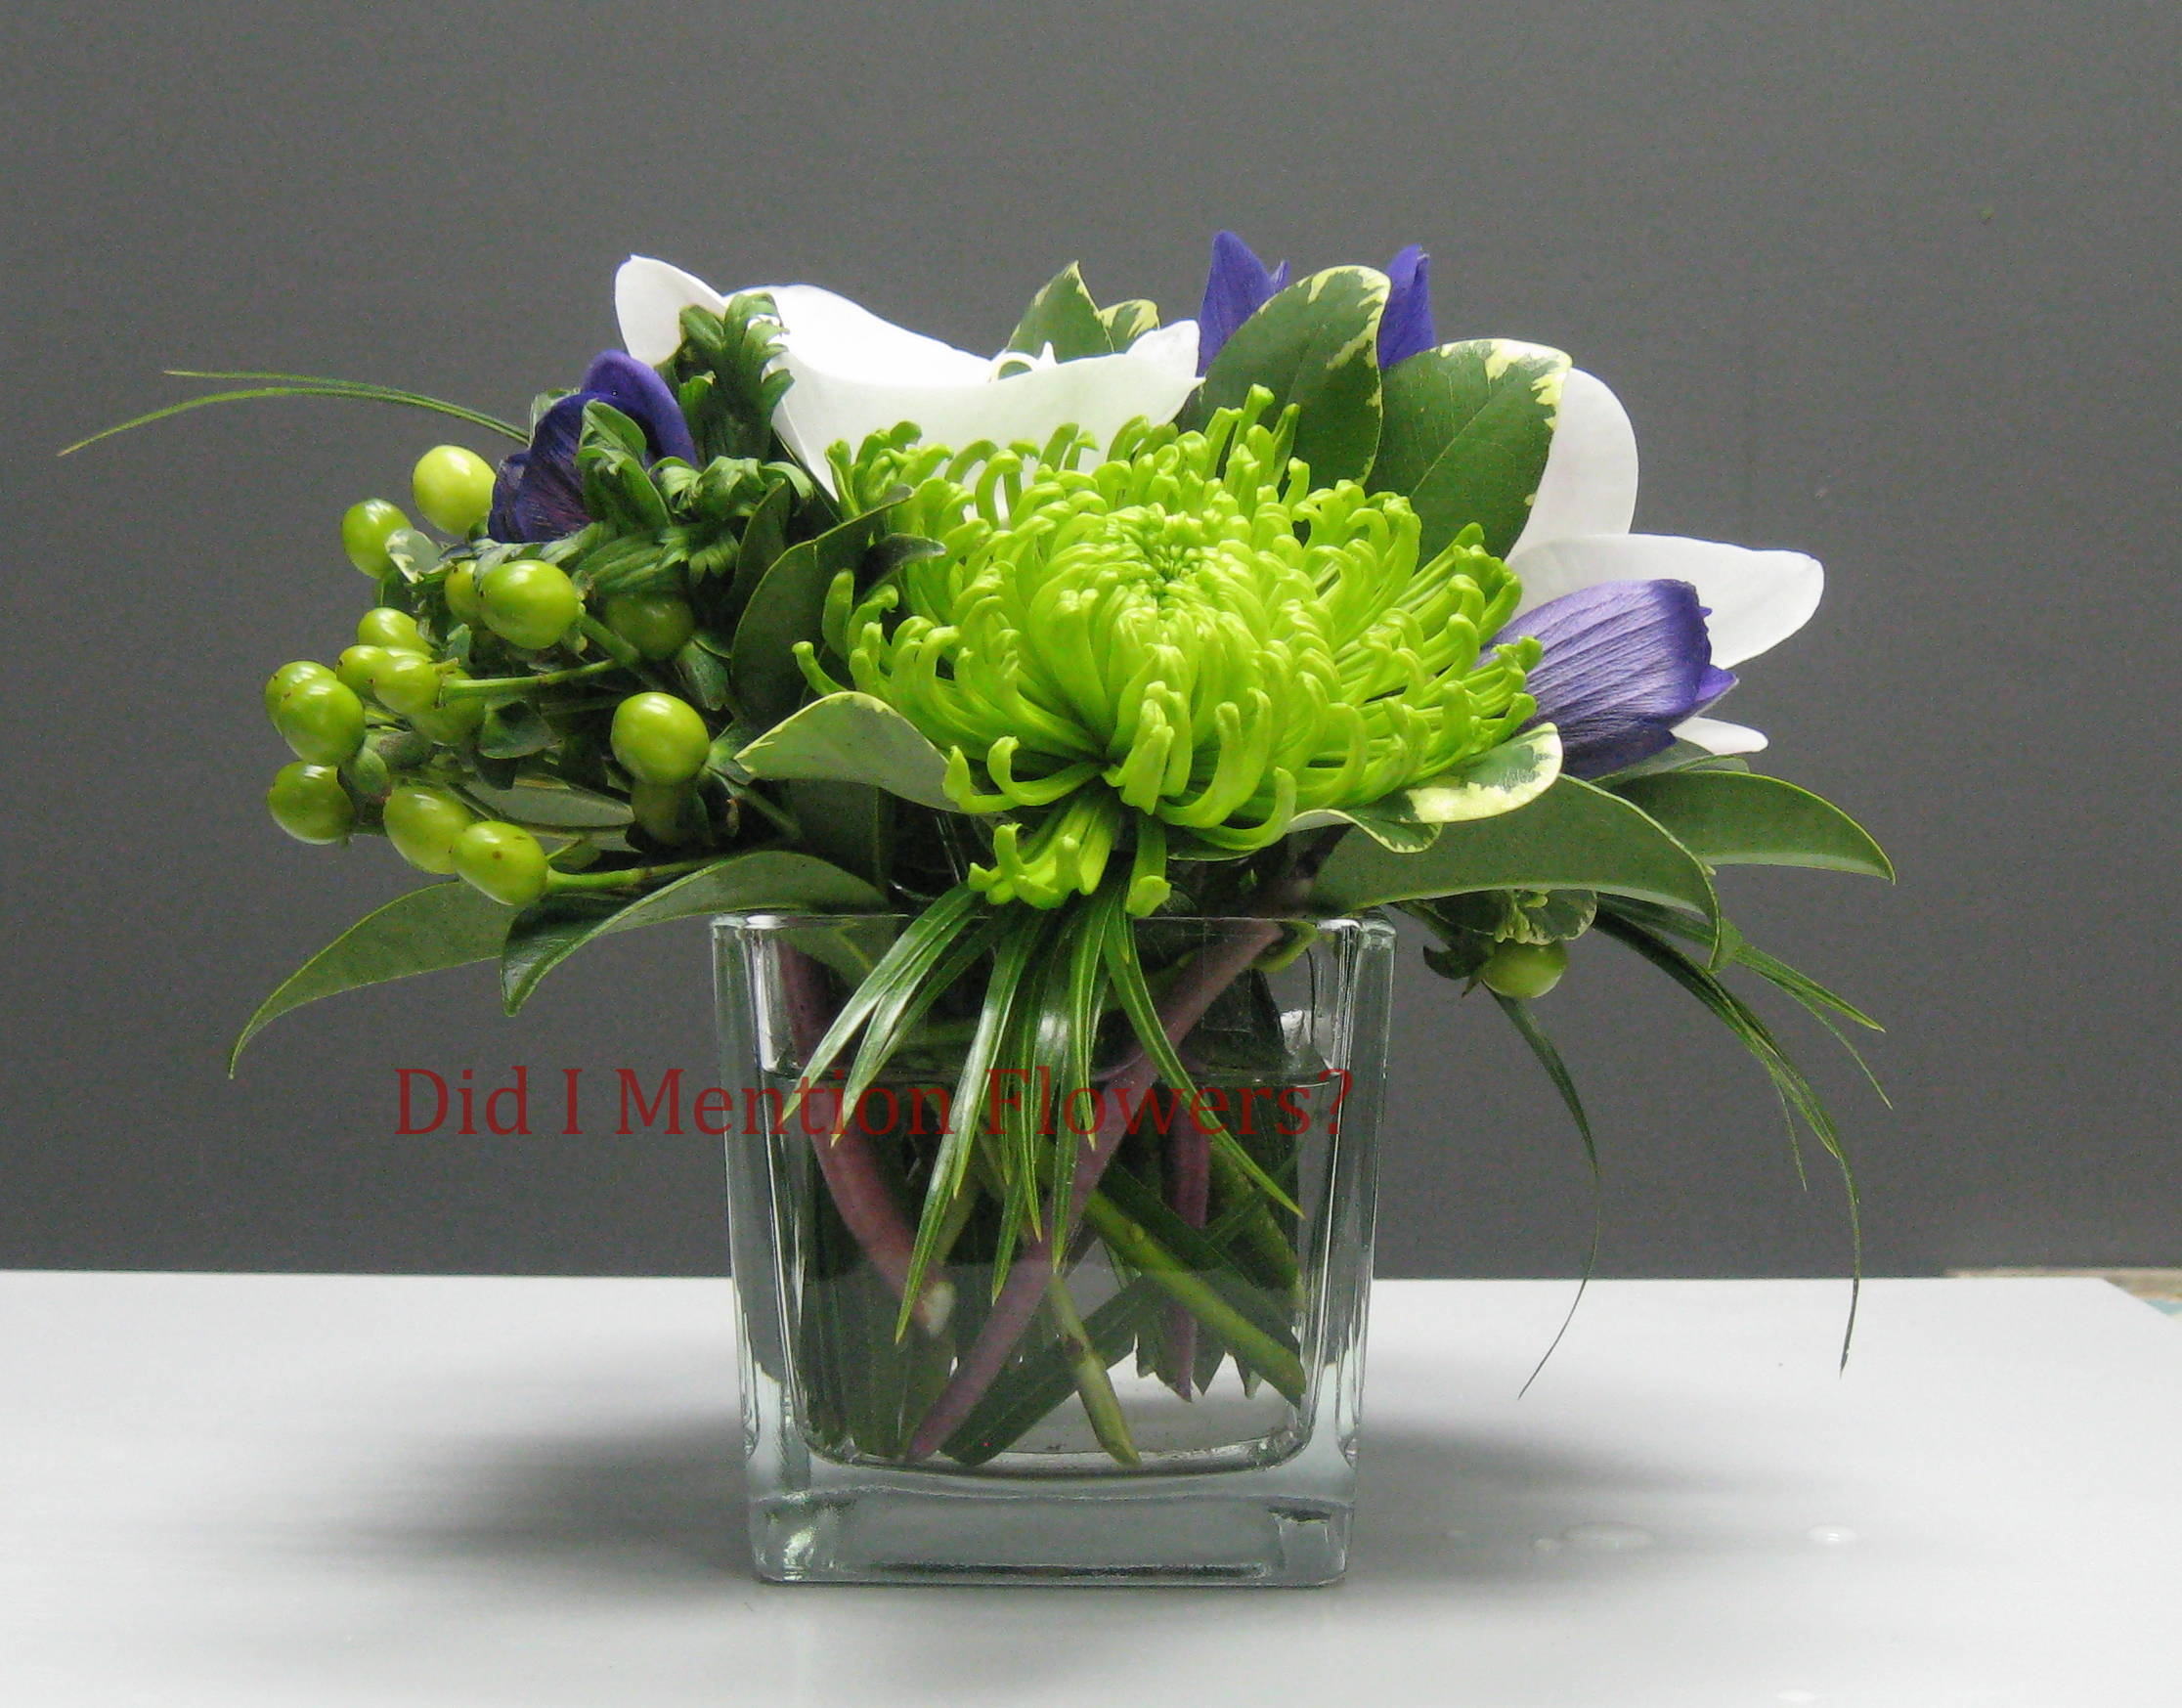 13 - Vase Arrangement